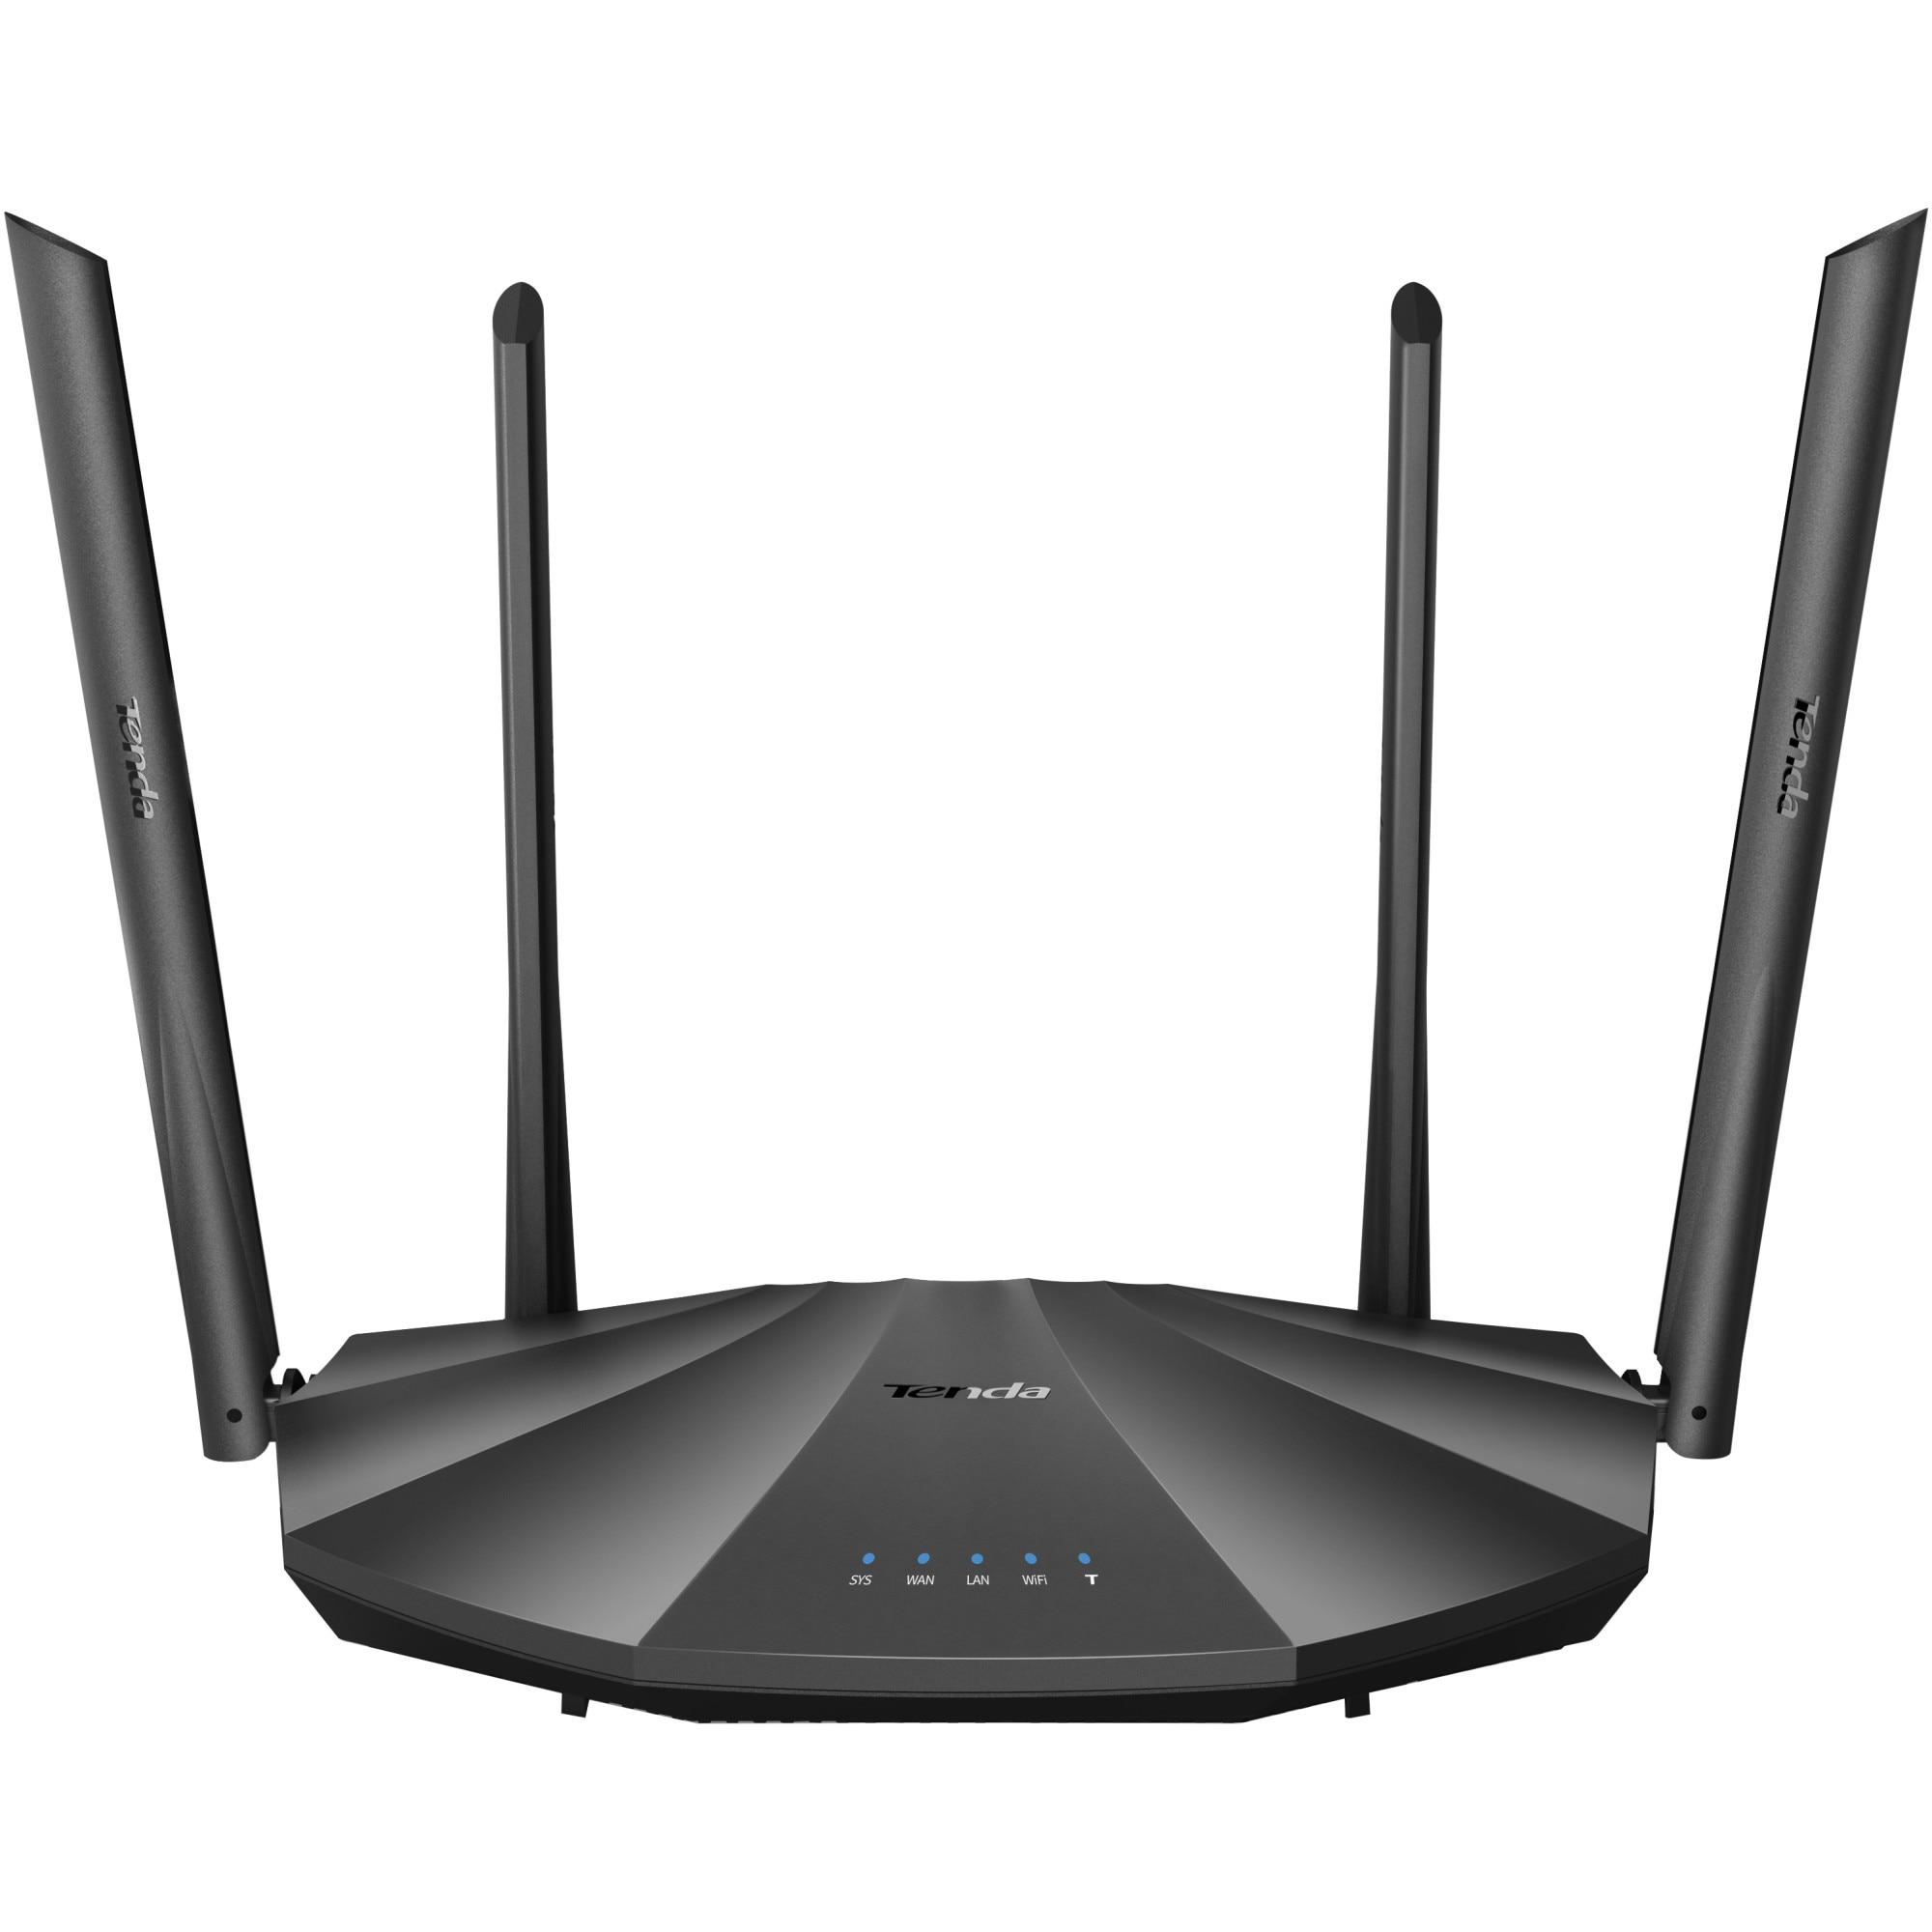 Fotografie Router wireless Tenda AC19, AC2100, Gigabit,USB, dual-band, 4 antene, firewall, MU-MIMO, Wave 2, dual core, IPv6